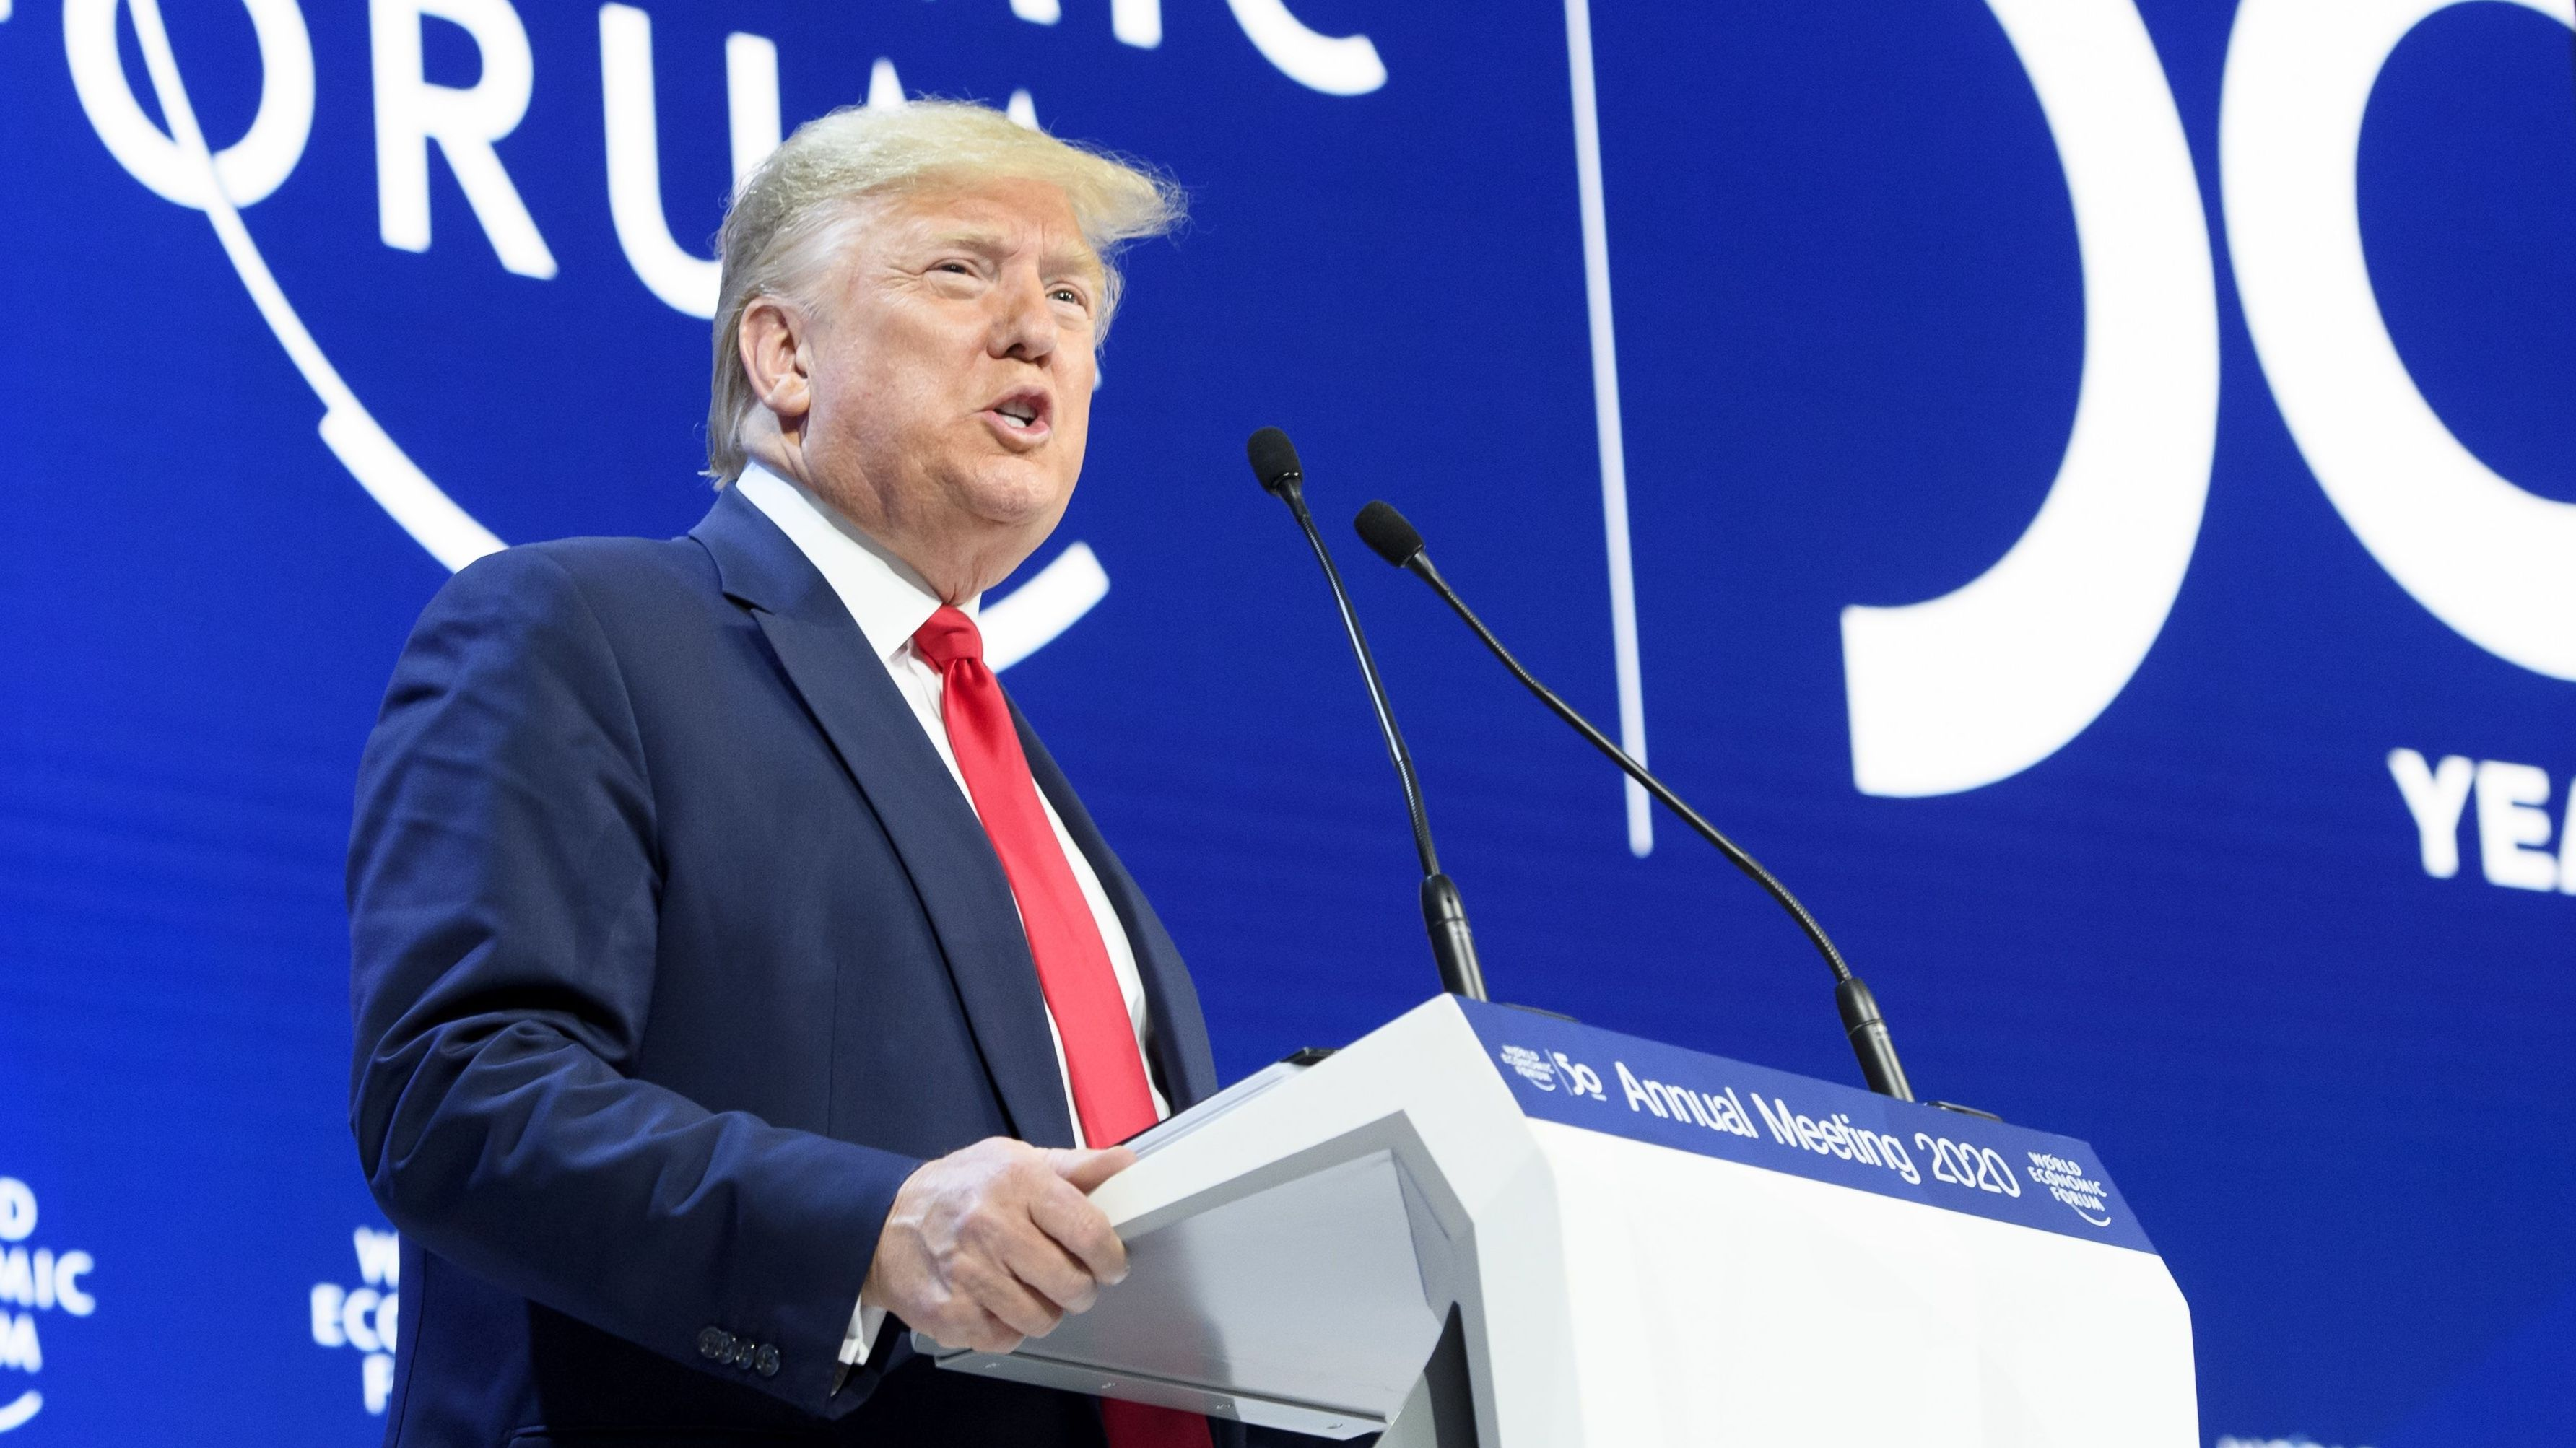 Donald Trump in Davos